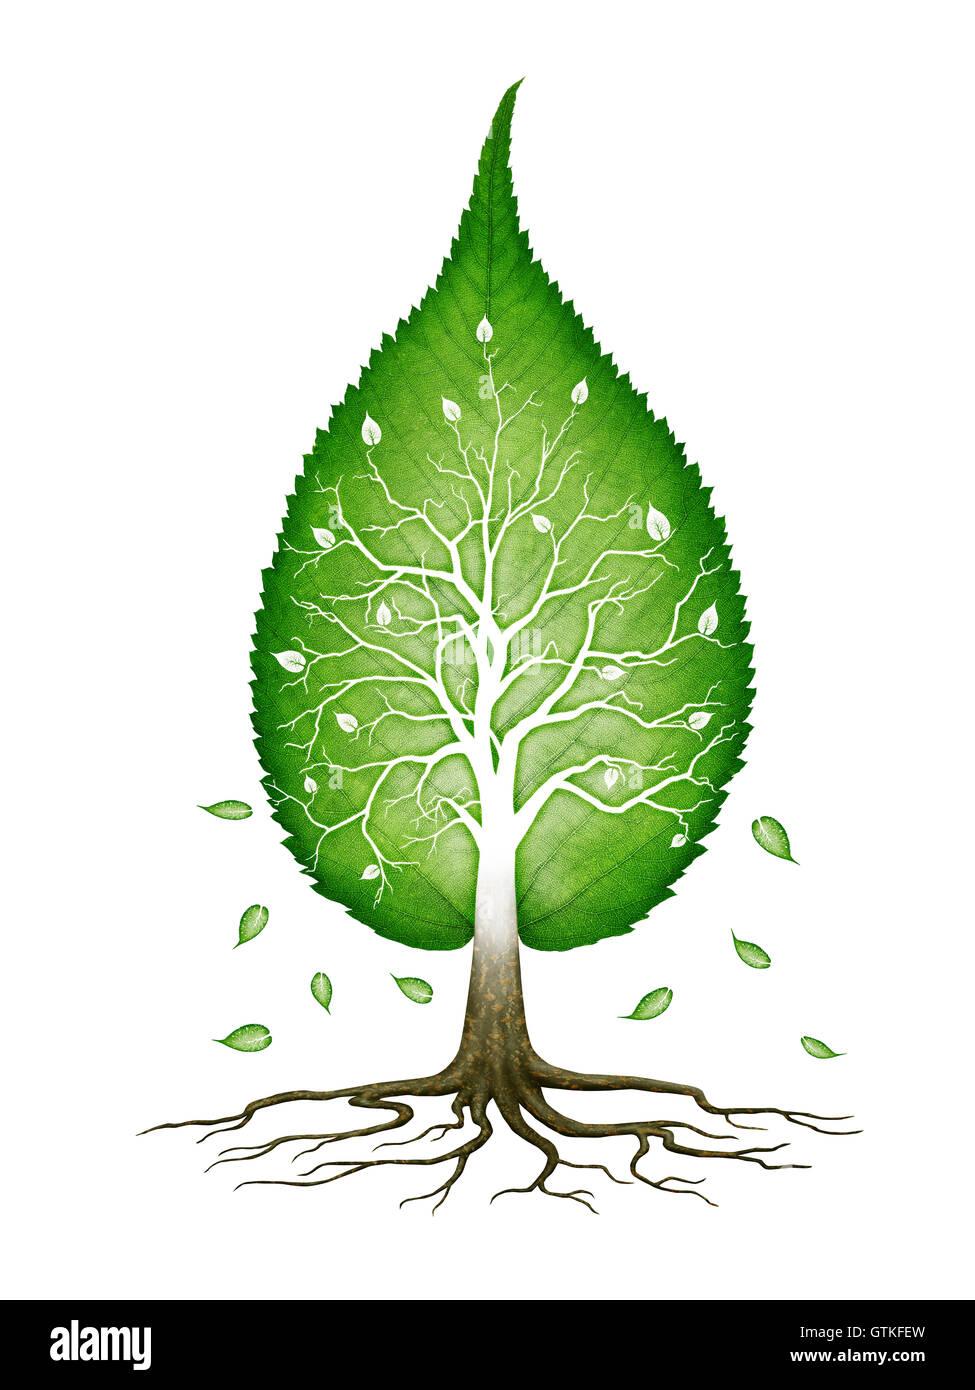 En forme de feuille verte arbre avec branches et racines fractales infinie nature zen concept spirituel isolé Photo Stock